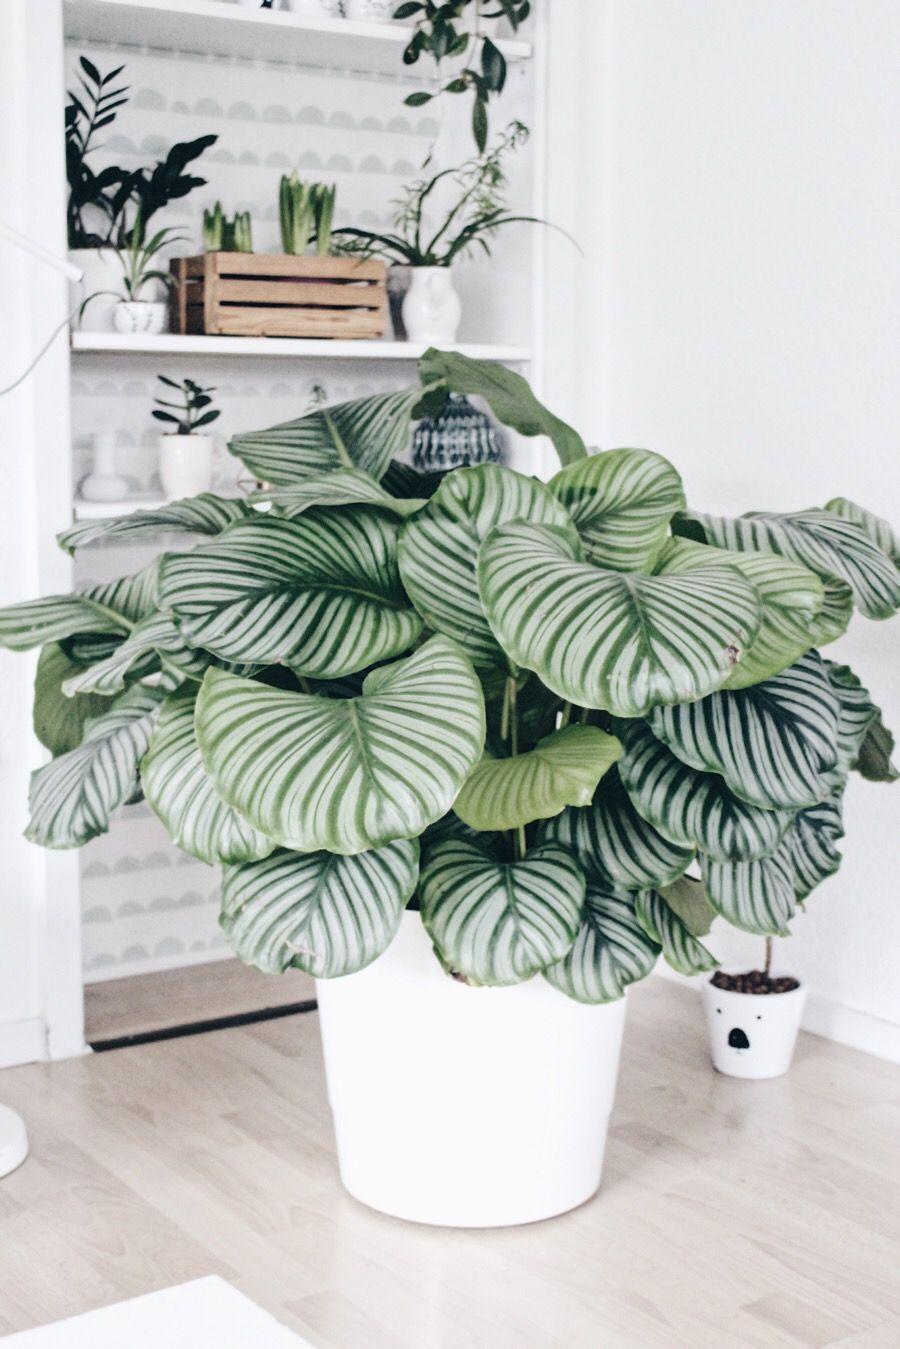 Calathea Pflanze Pflege